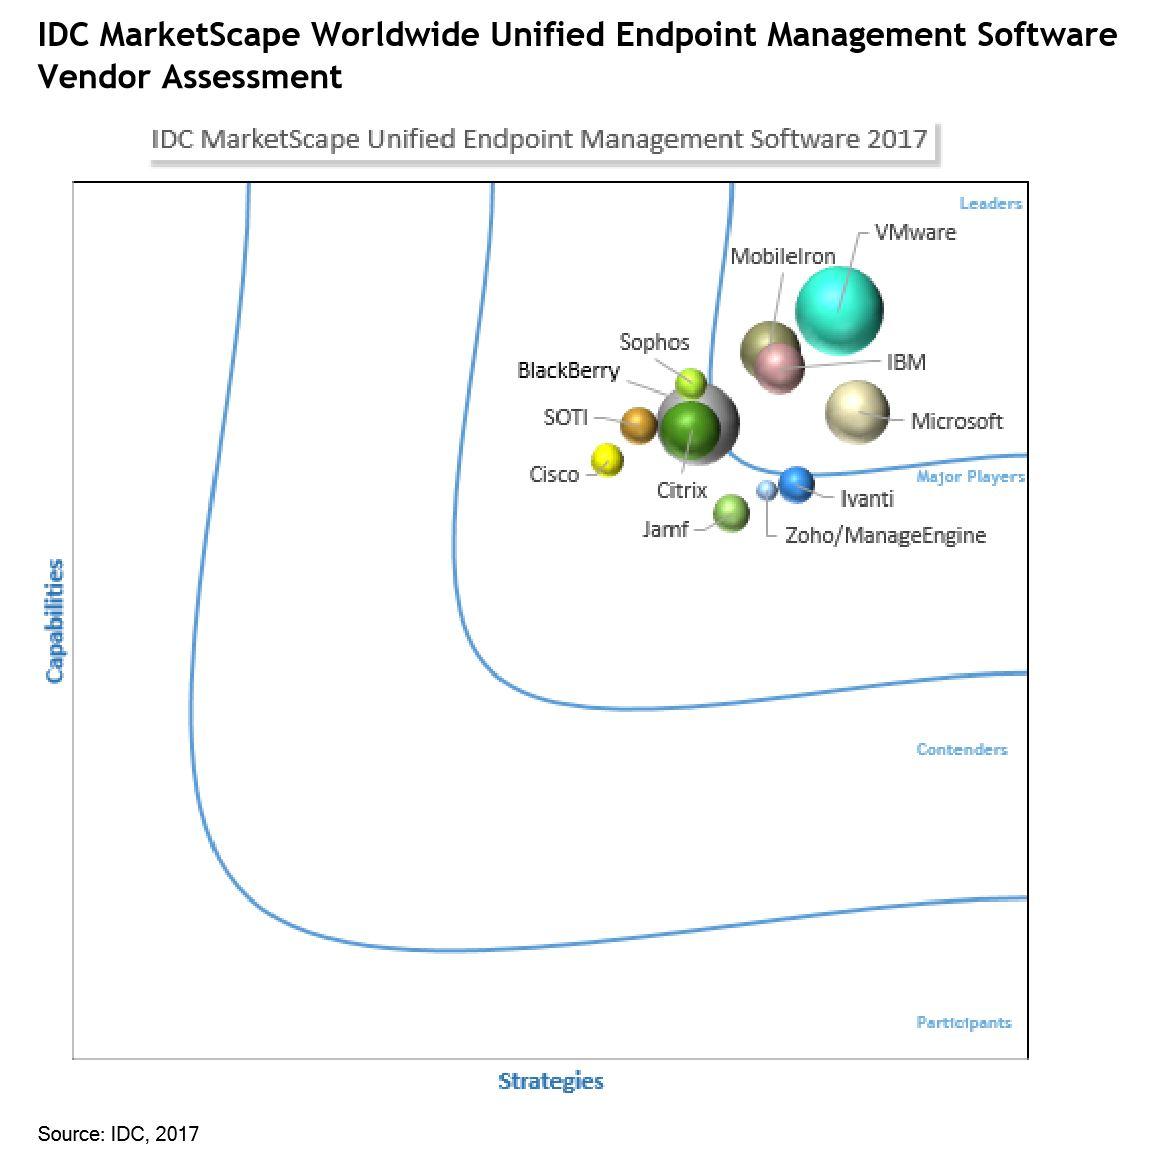 IDC UEM Assessment